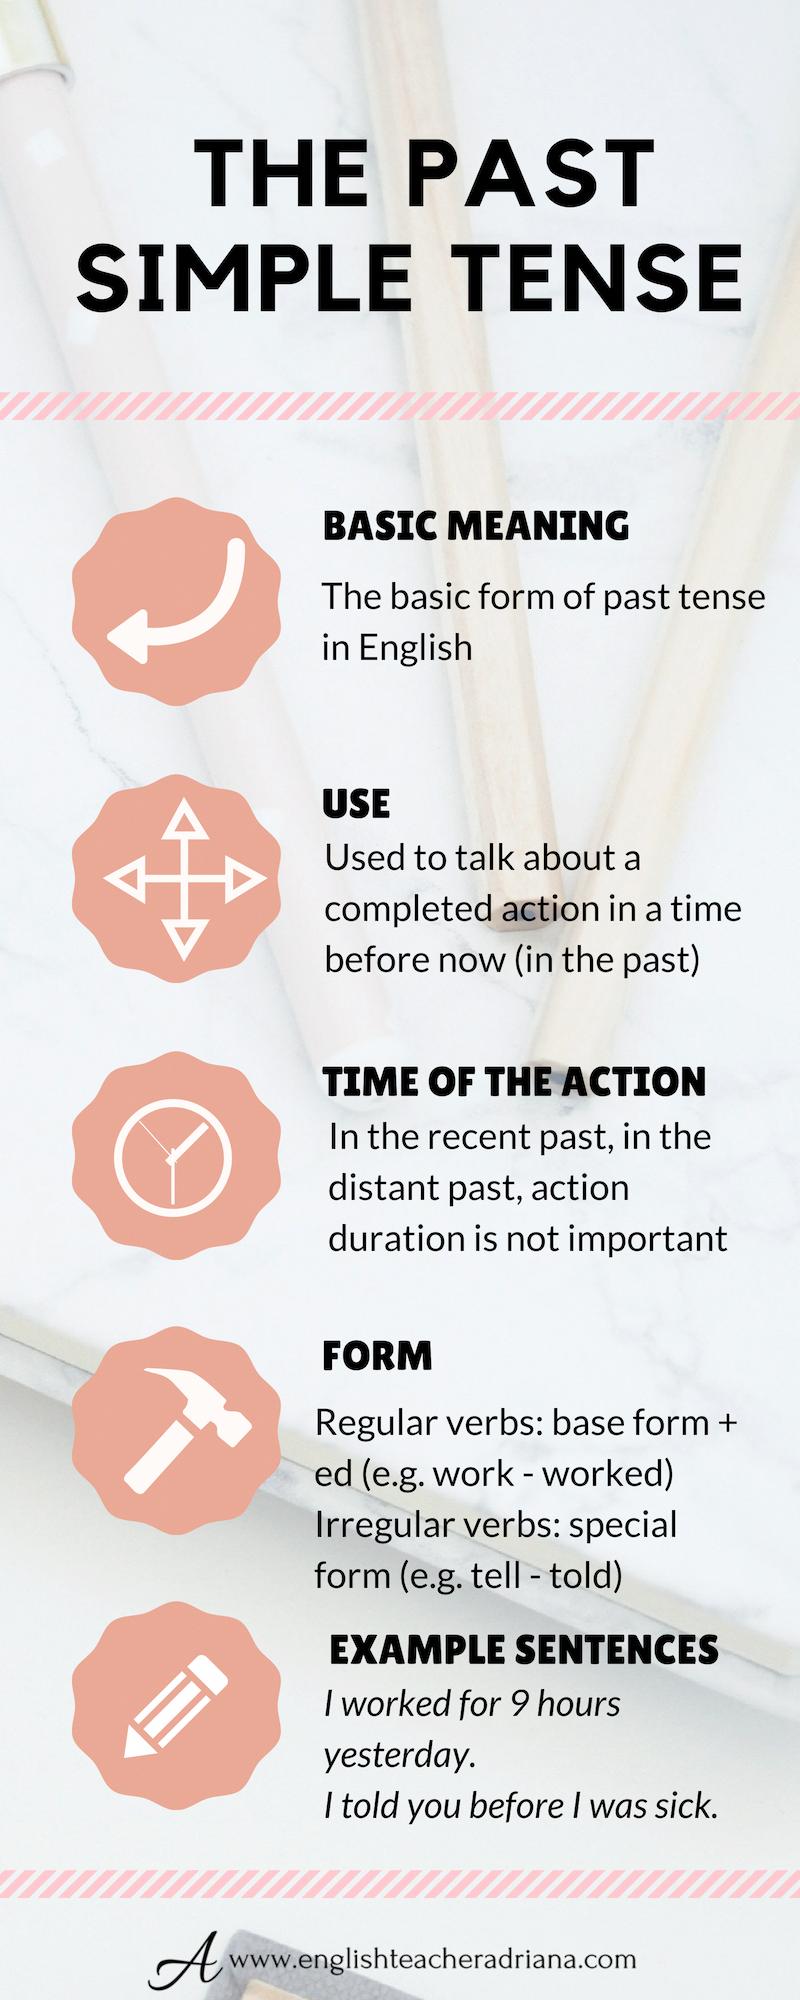 Simple Past English Grammar Lesson Click The Link Below To Watch The Full English Grammar Lesson Spe Grammar Lessons English Grammar English Speaking Skills [ 2000 x 800 Pixel ]